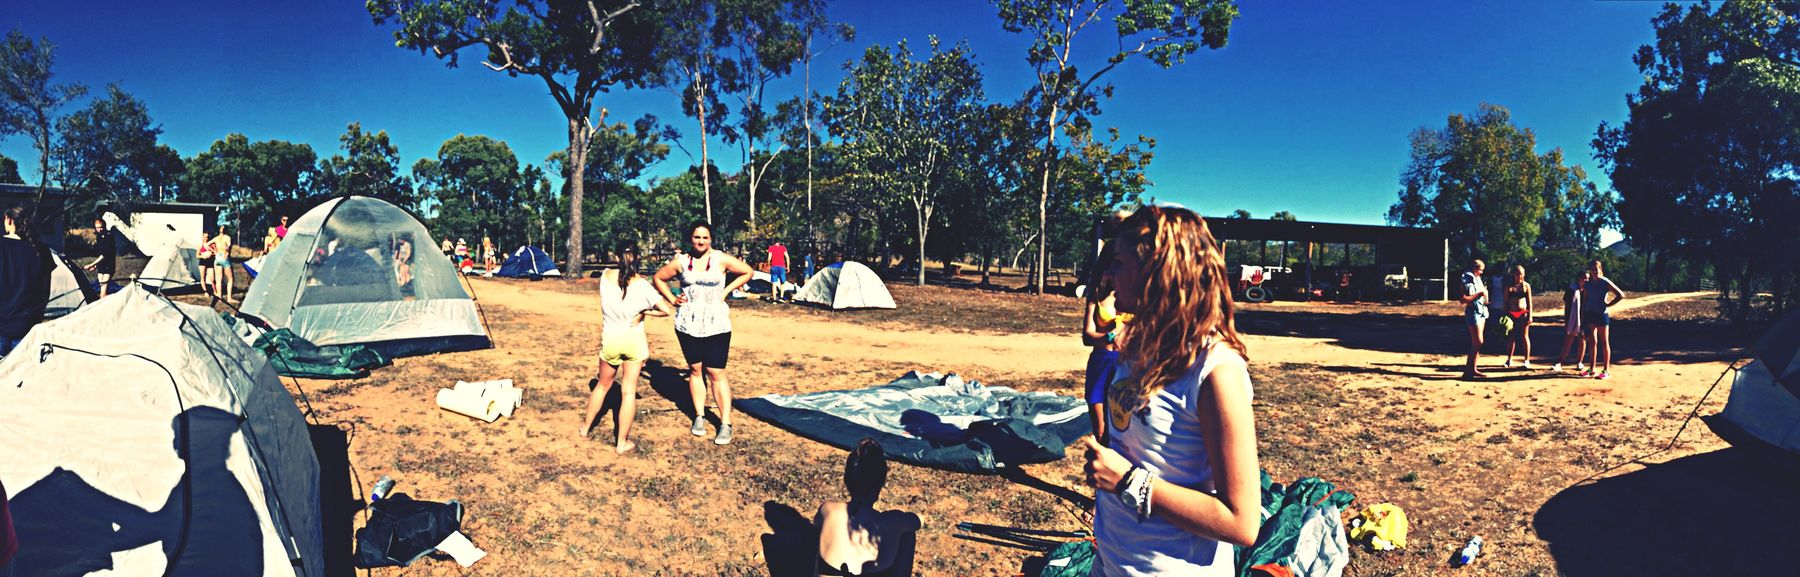 Chillagoe Australia Camping Outback